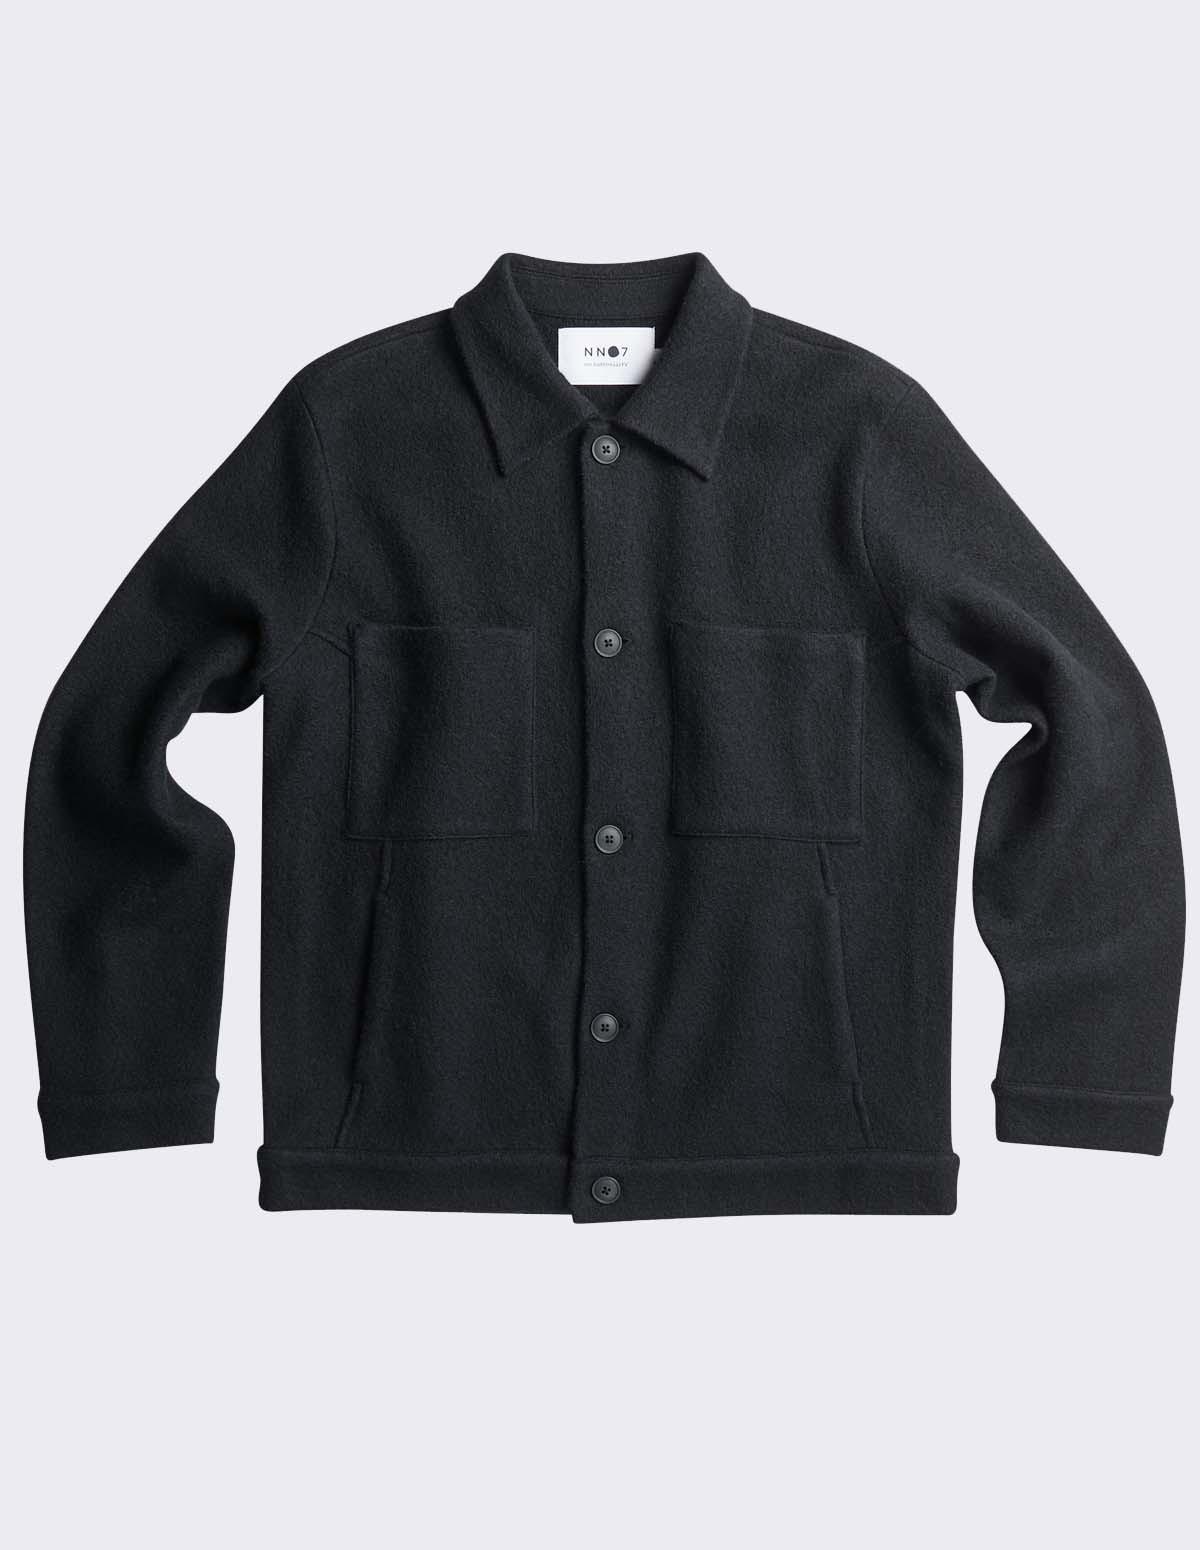 Nn07 Alvin Boiled Wool 6400 - 999 BLACK